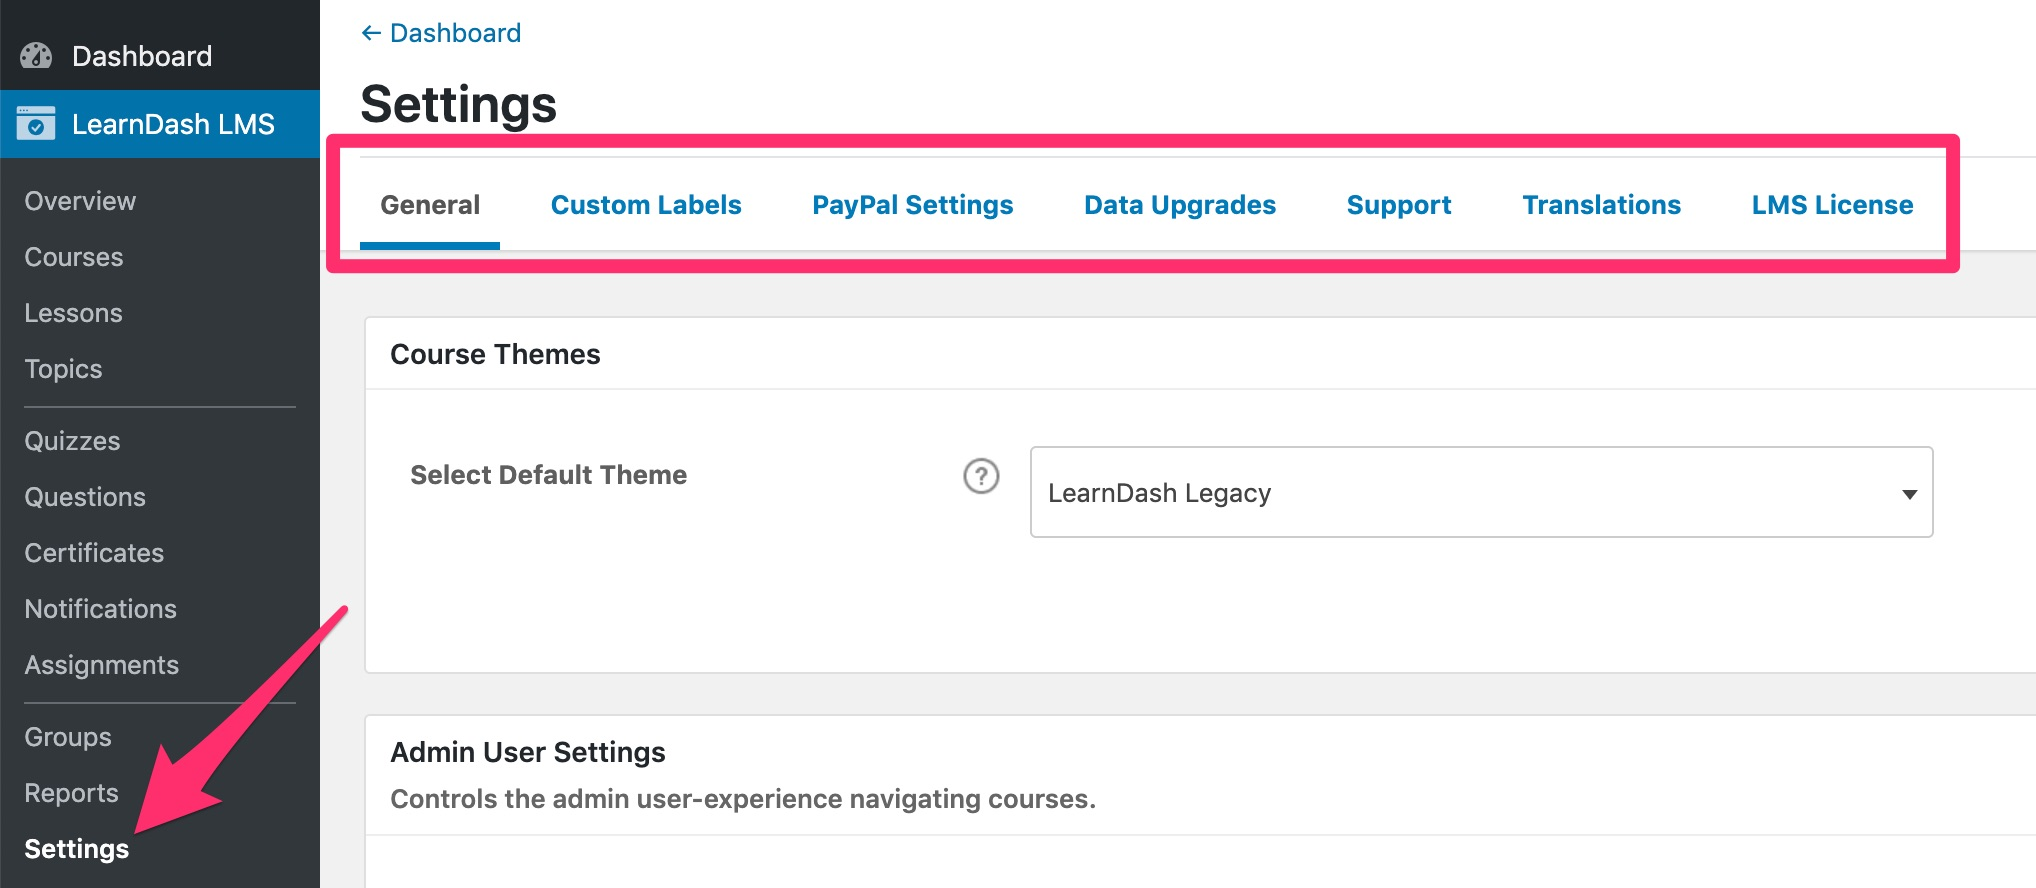 LearnDash settings navigation menu